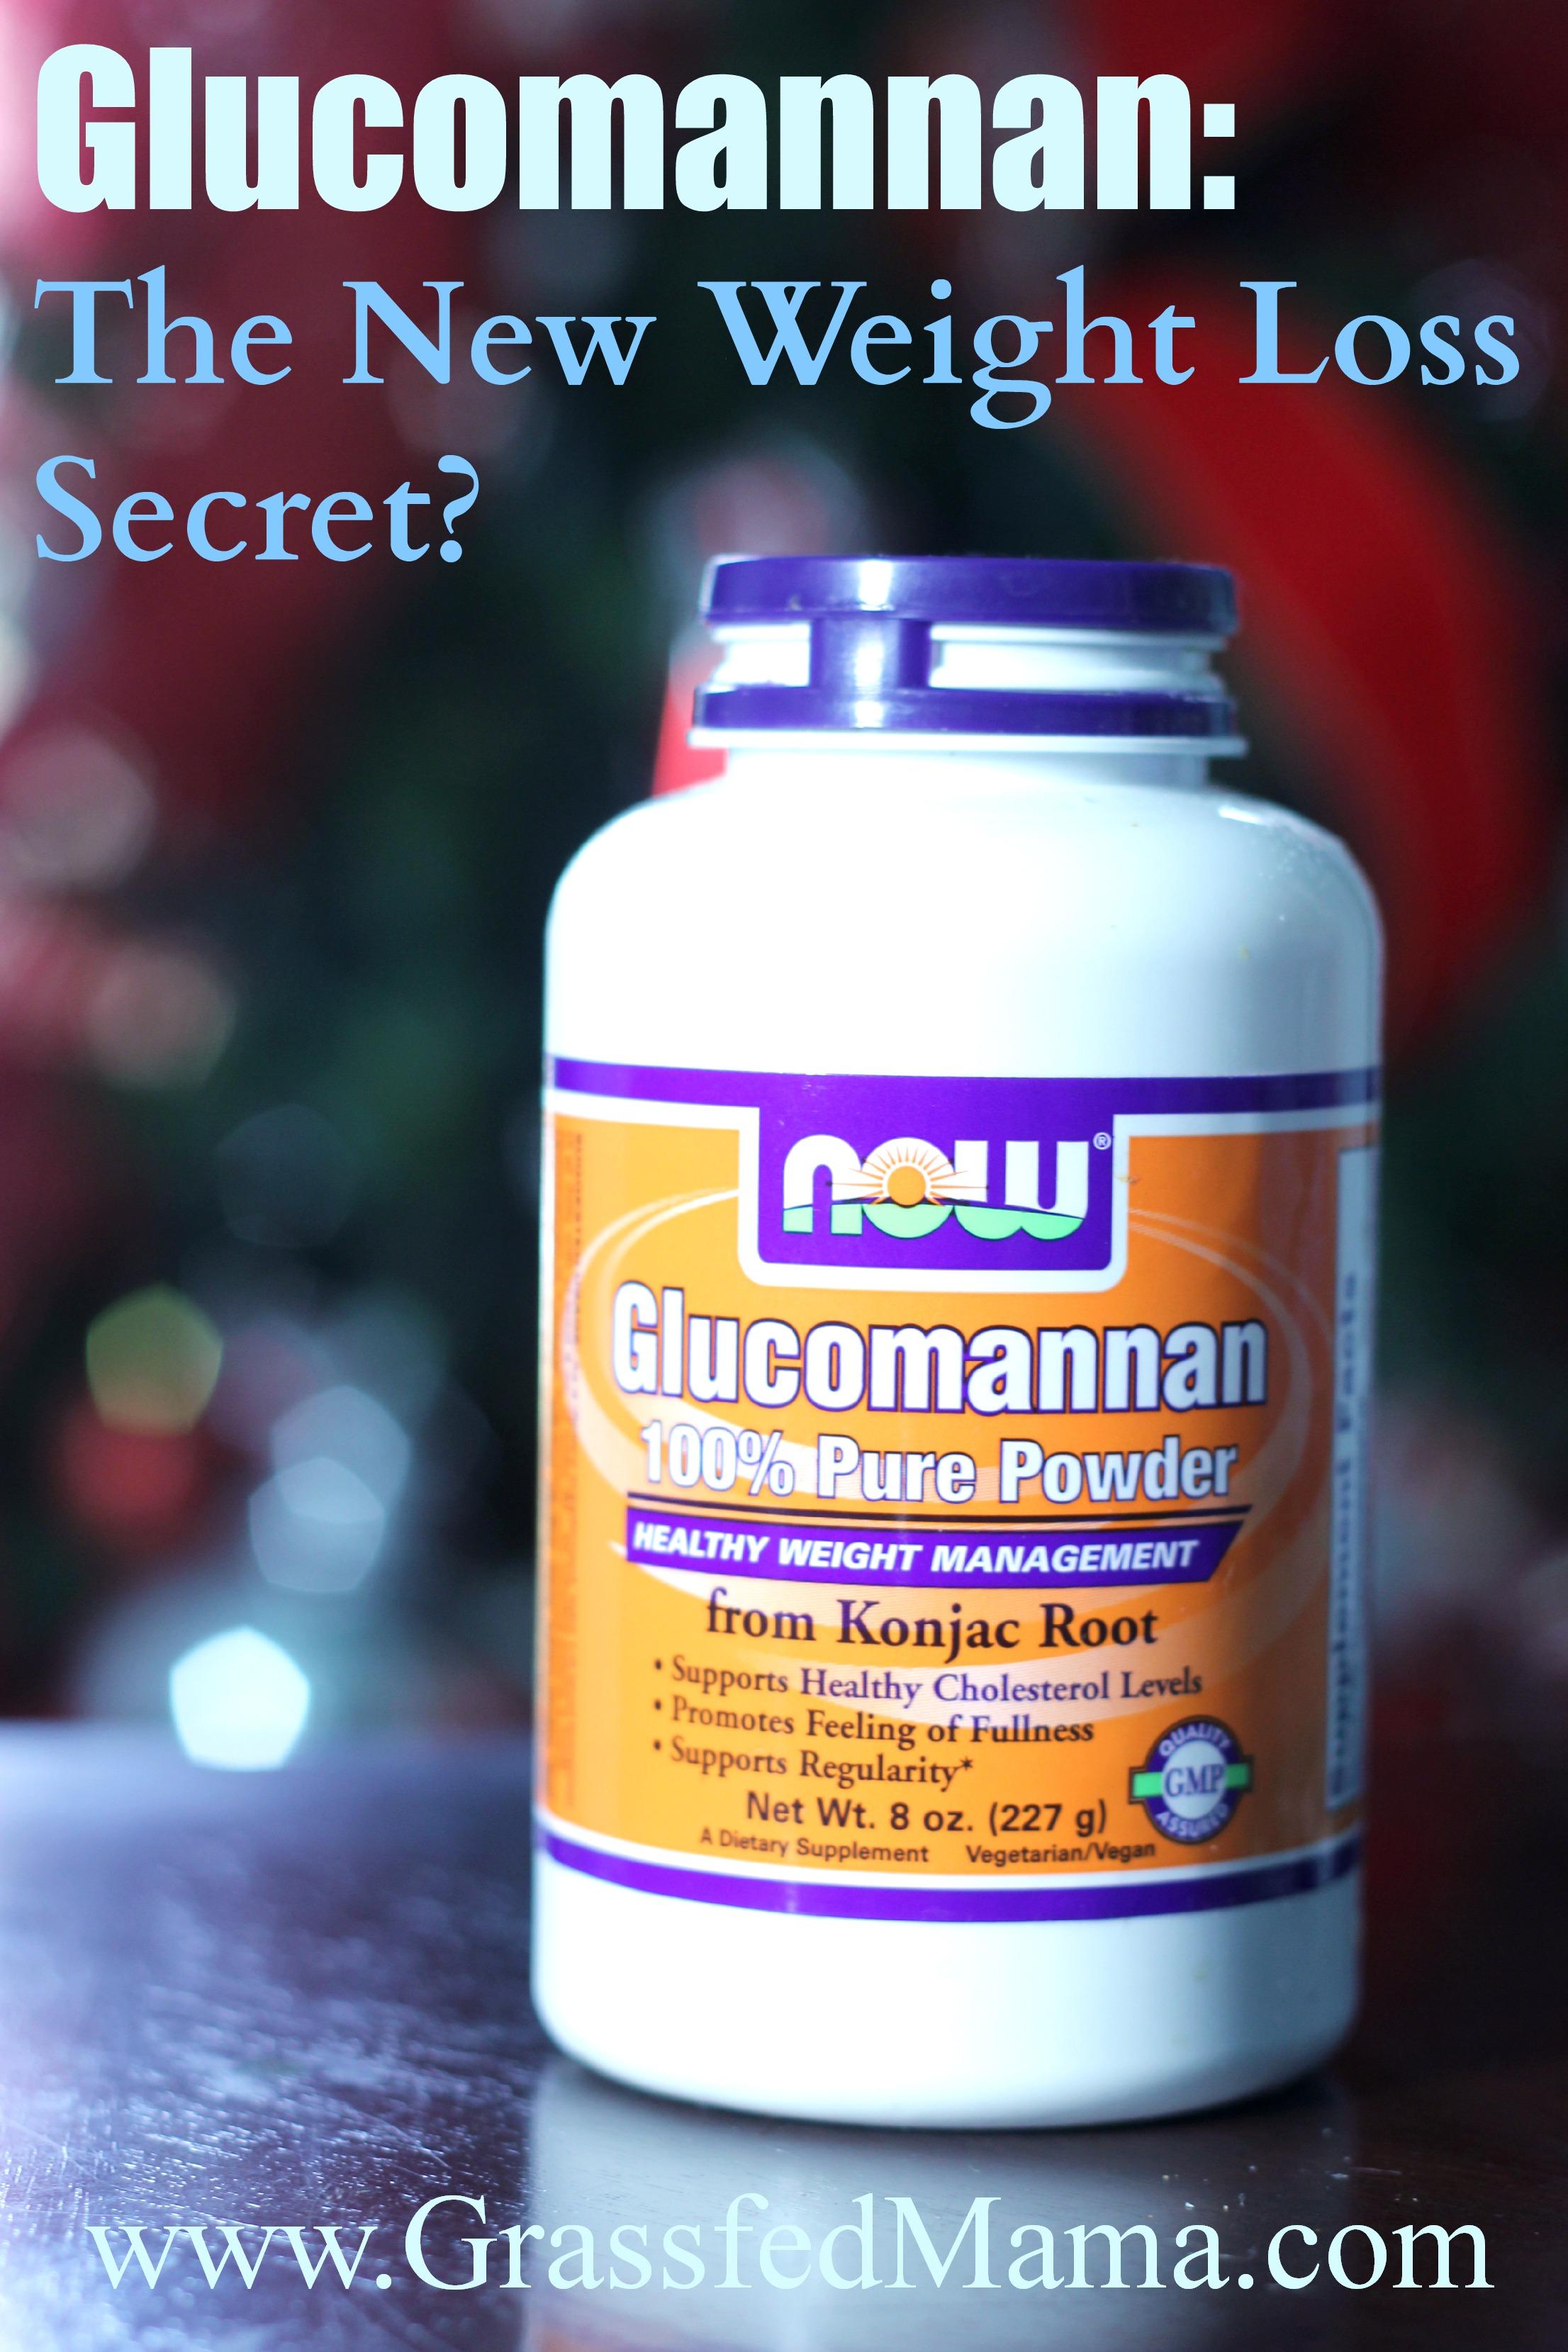 Glucomannan: The New Weight Loss Secret? - Grassfed Mama